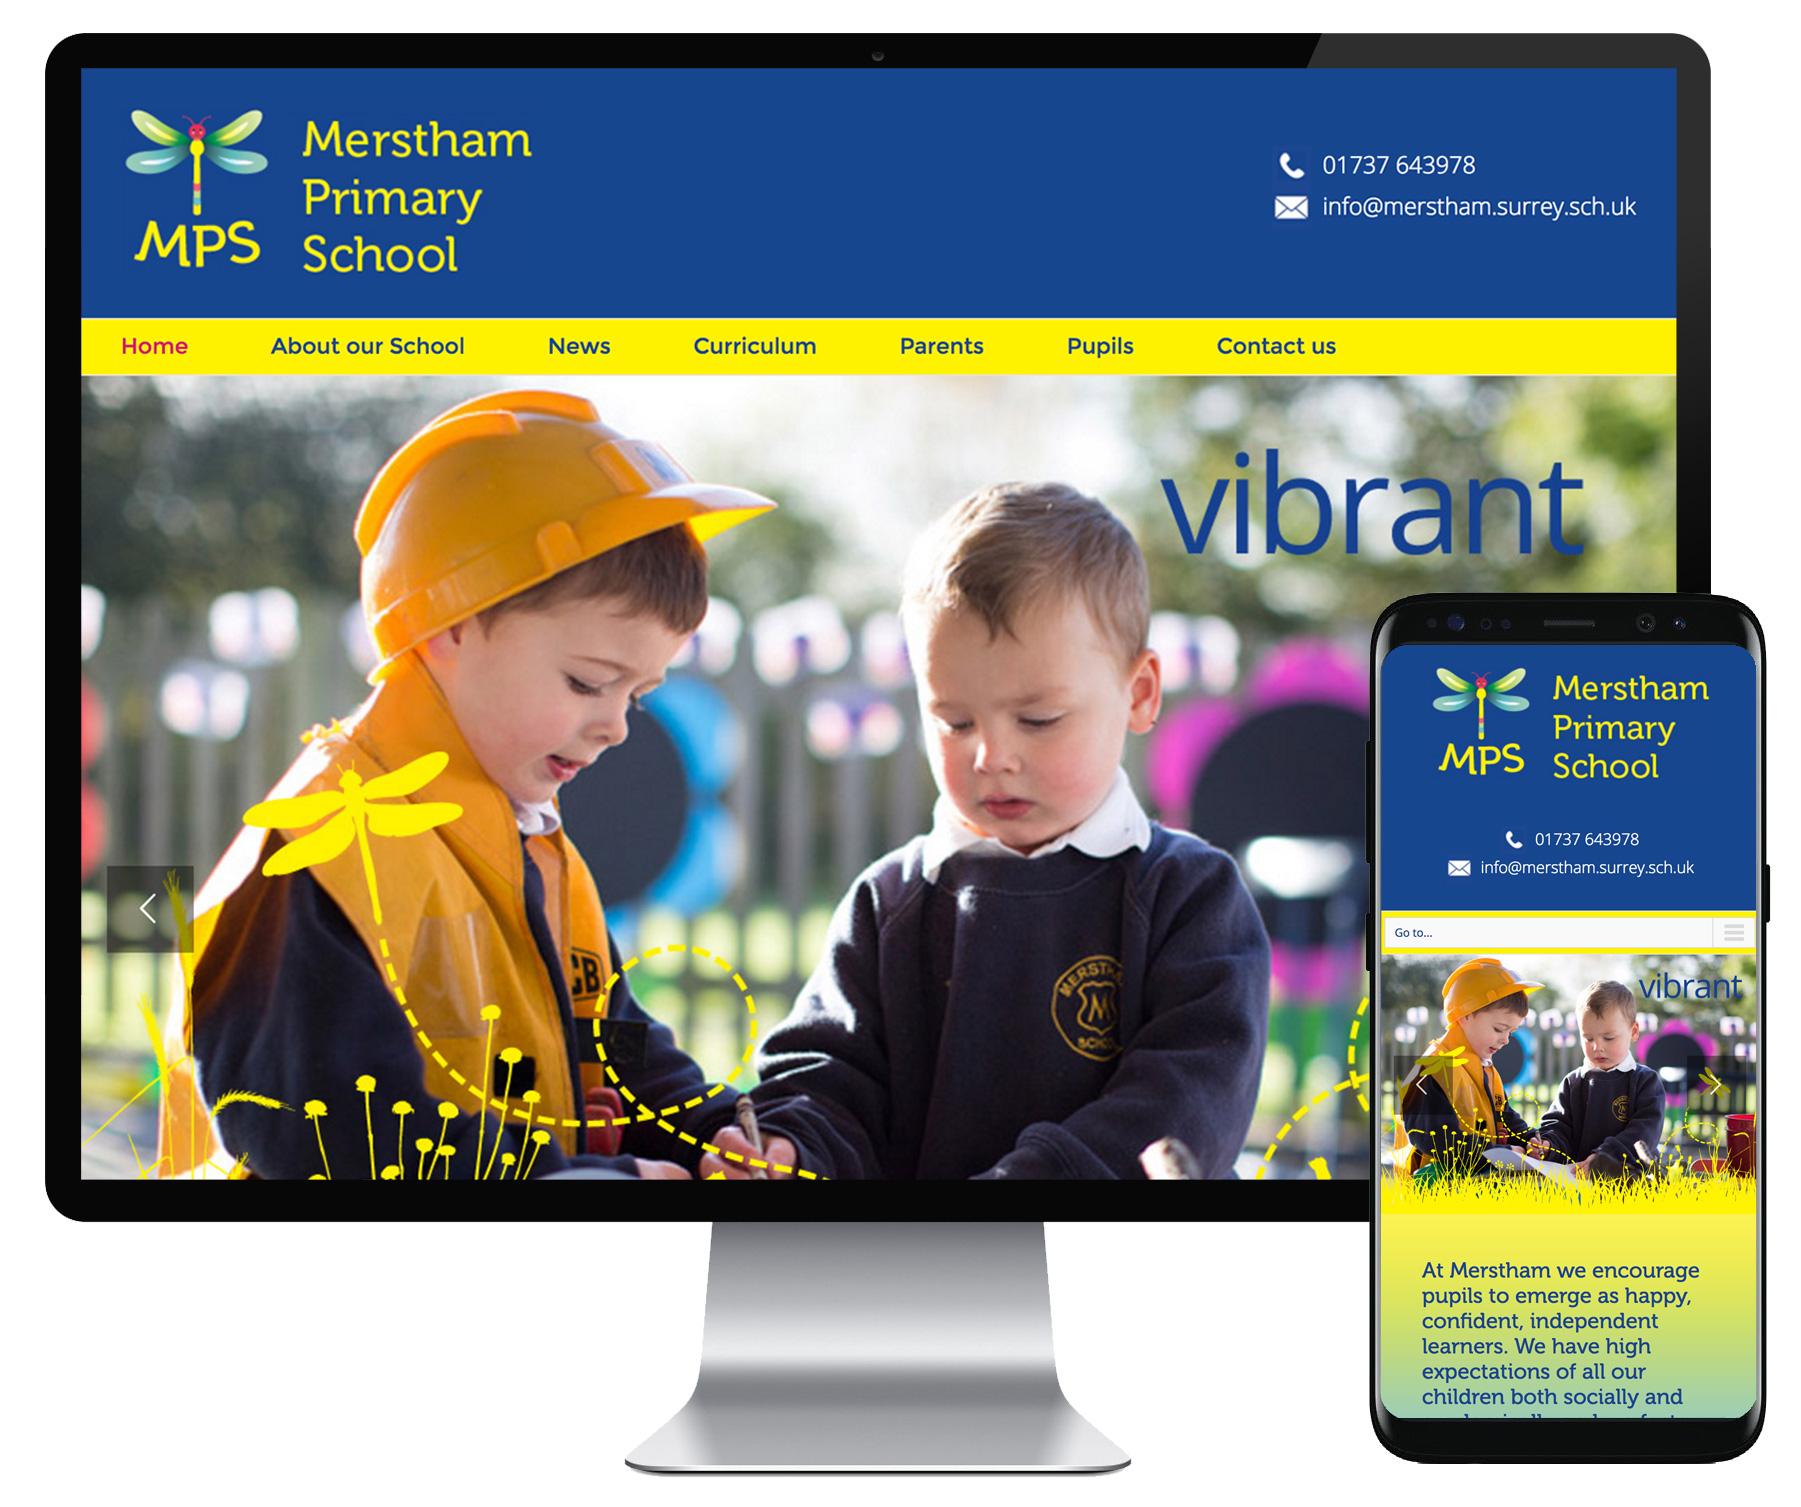 Merstham Primary School website